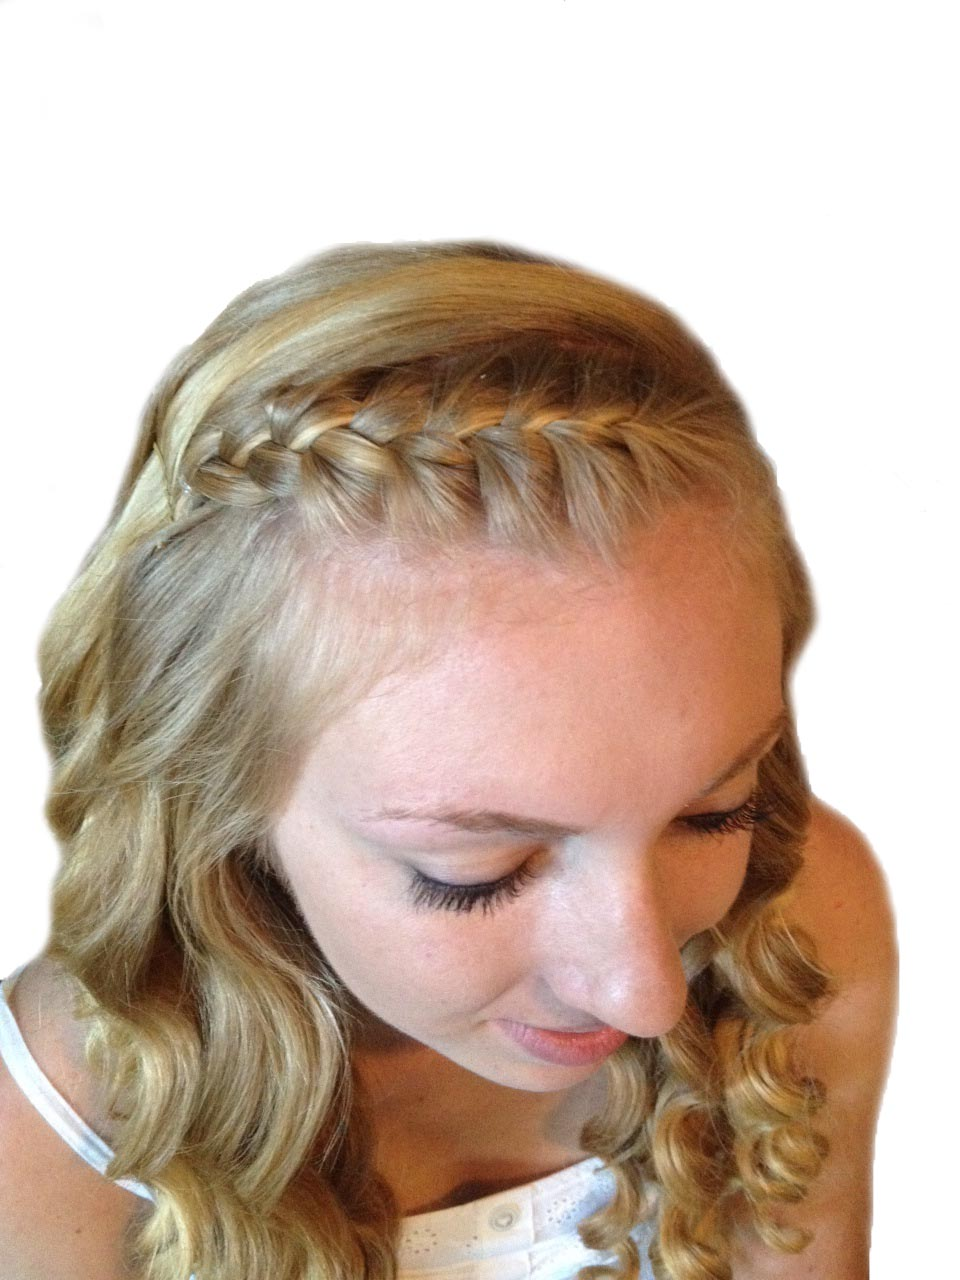 taylor swift braids taylor swift hair braid taylor swift